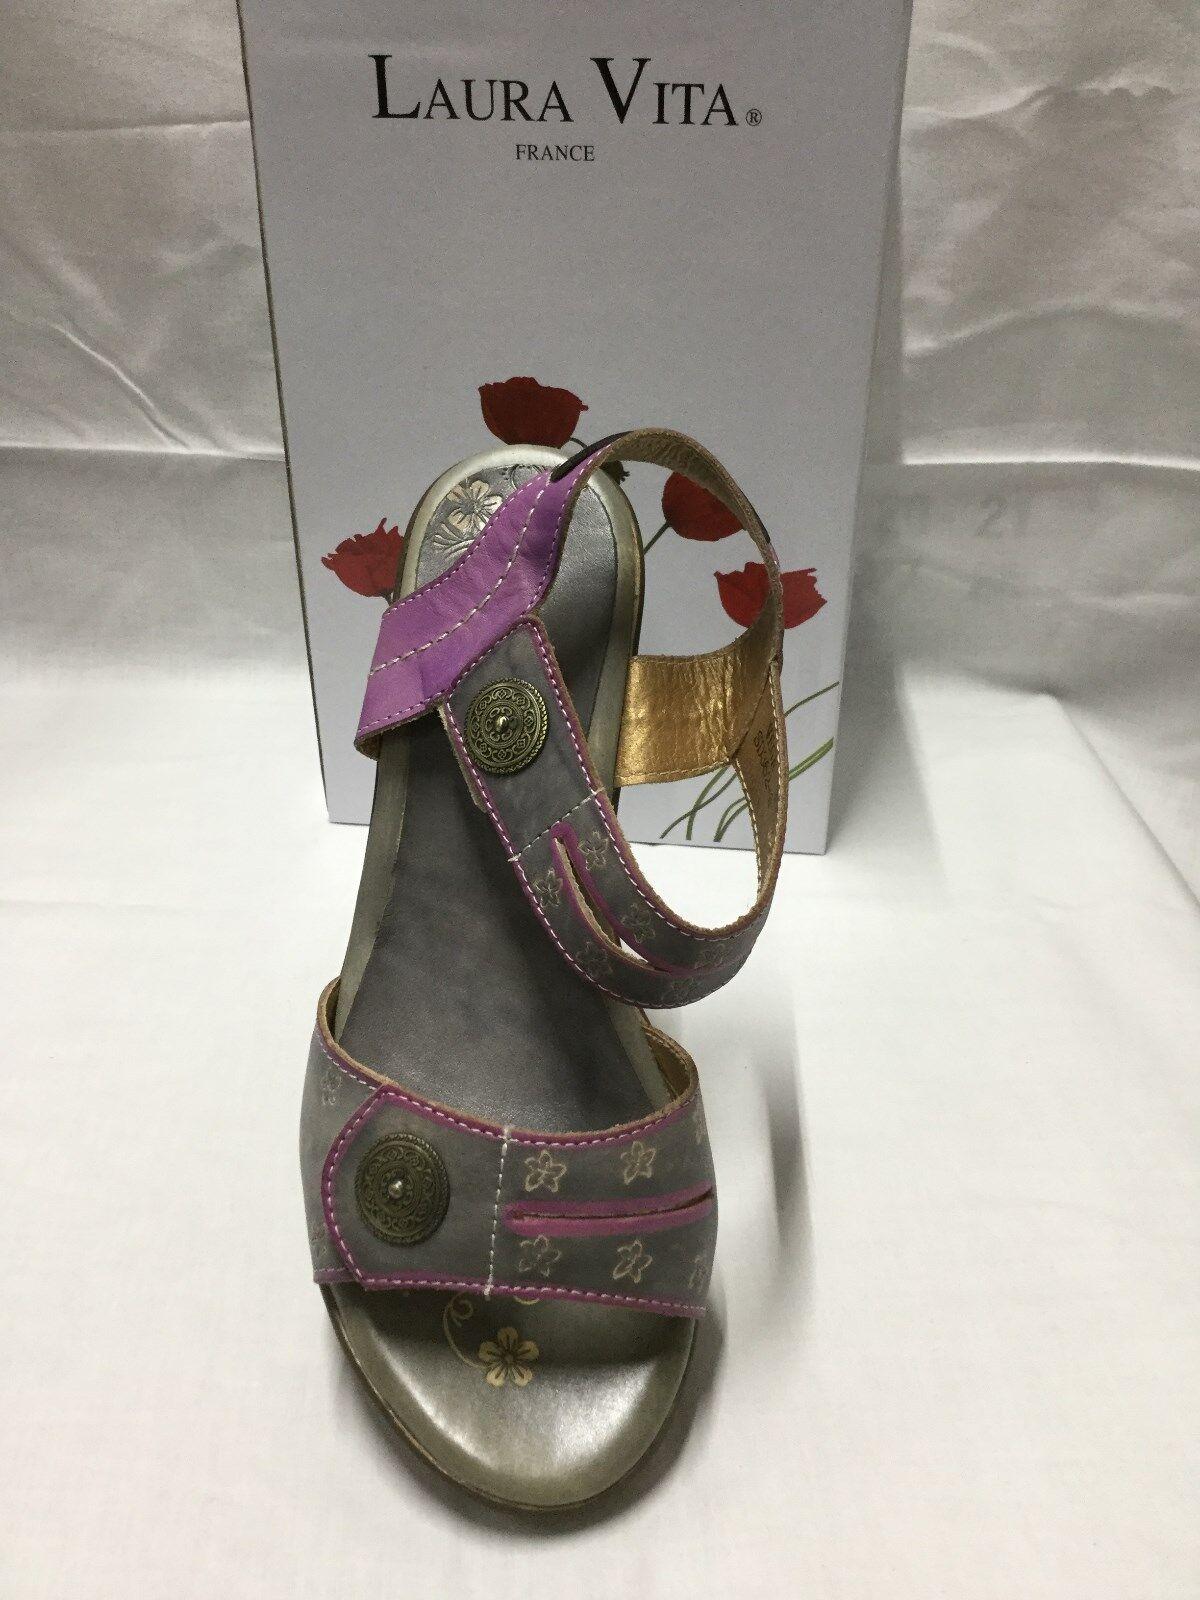 Zapatos señoras Laura Vita Vega gris Tamaño 8 8 8 39 Hecho En Francia  excelentes precios